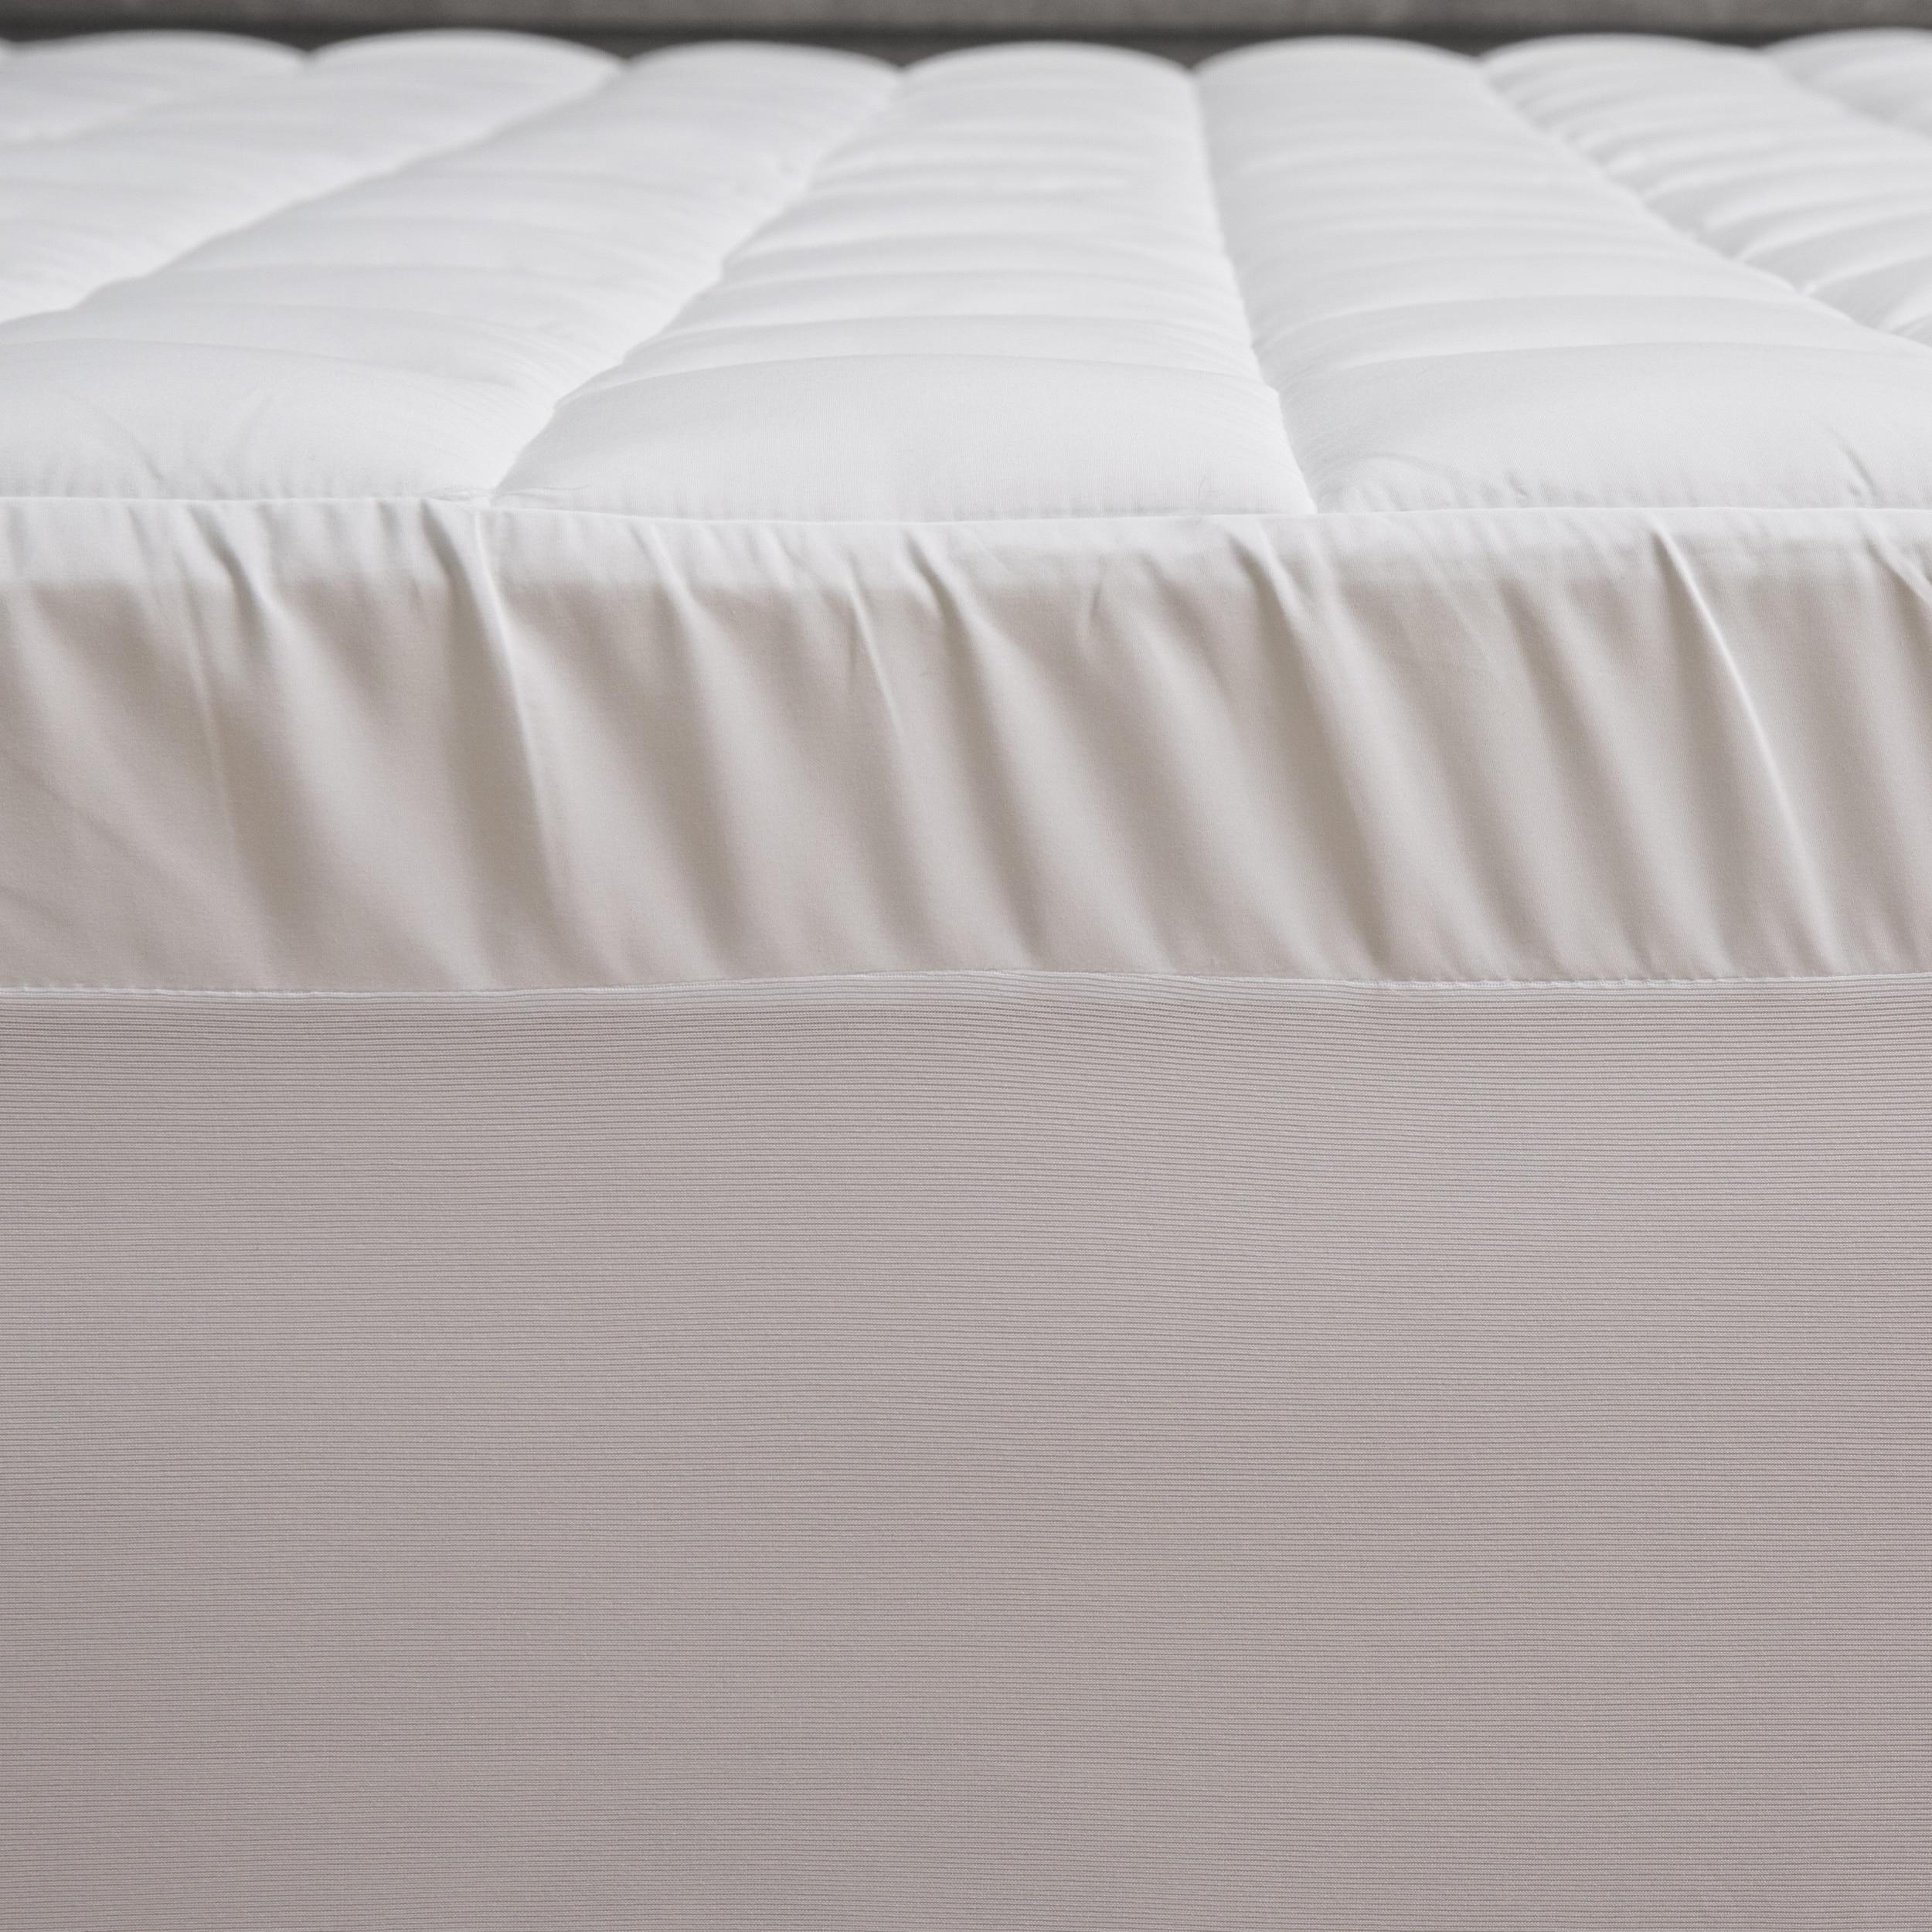 dual amazon gel innovations com sleep foam memory layer and plush fiber topper inch mattress pin